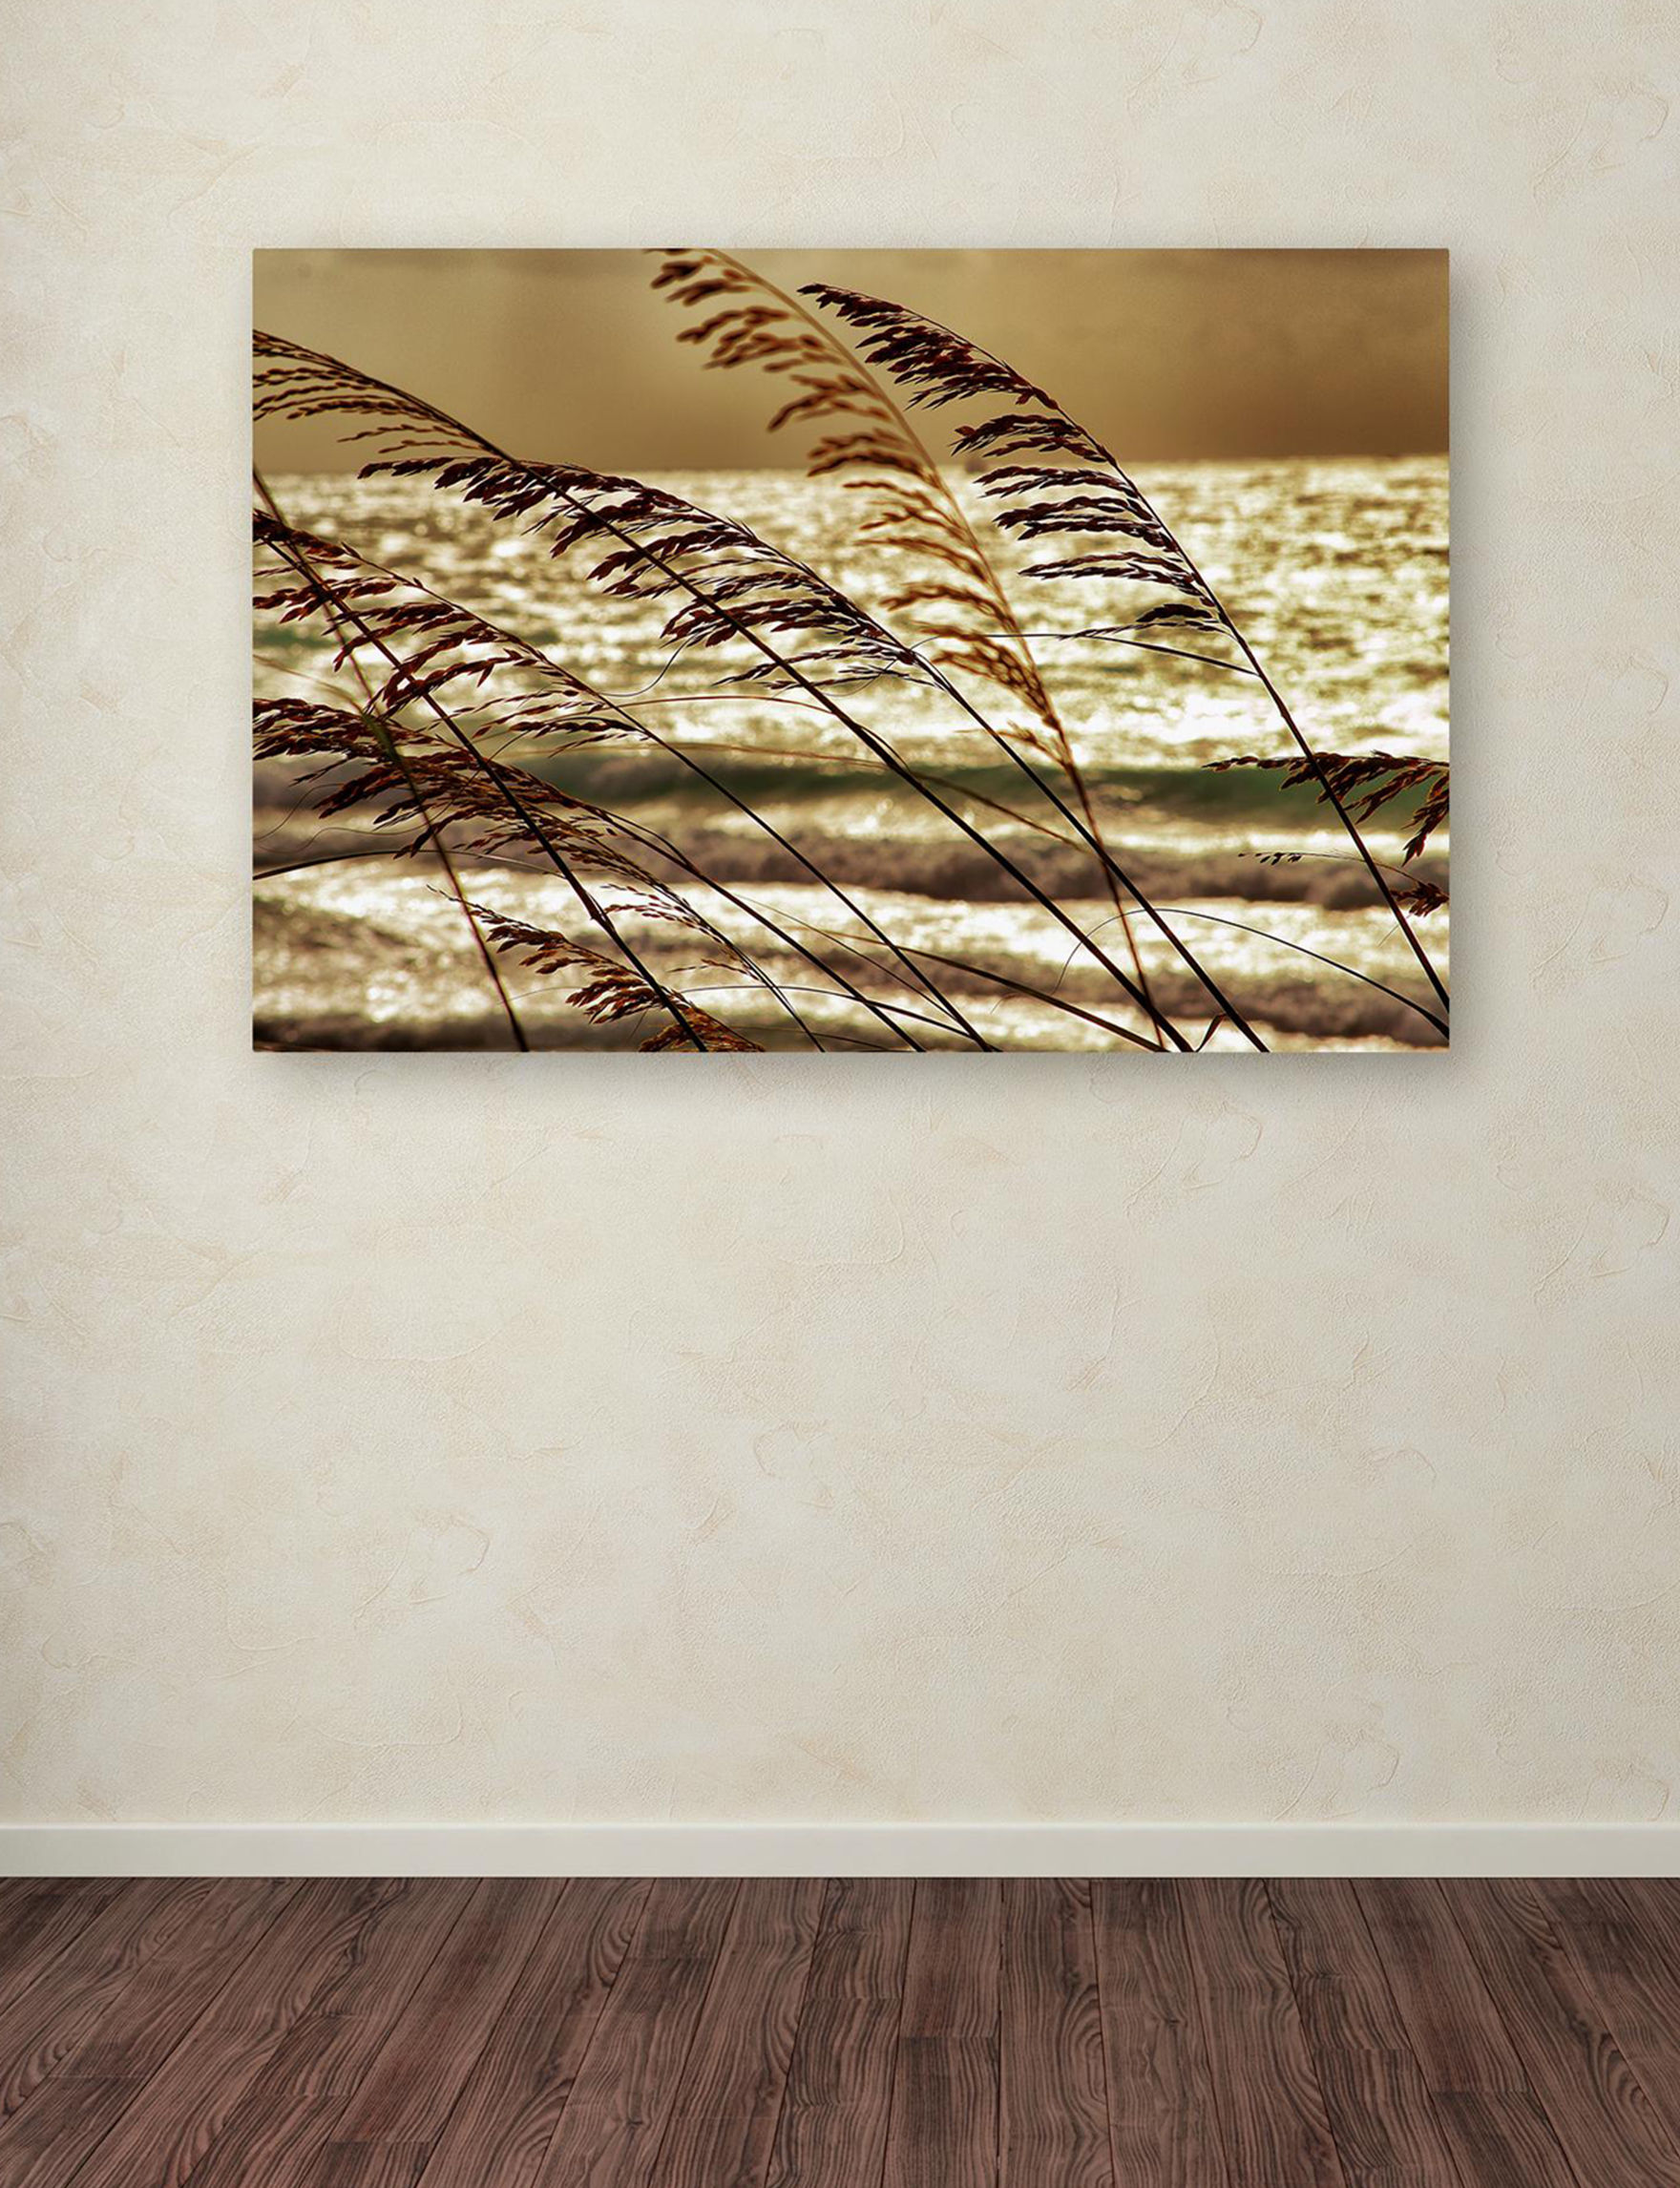 Trademark Fine Art Brown Wall Art Home Accents Wall Decor